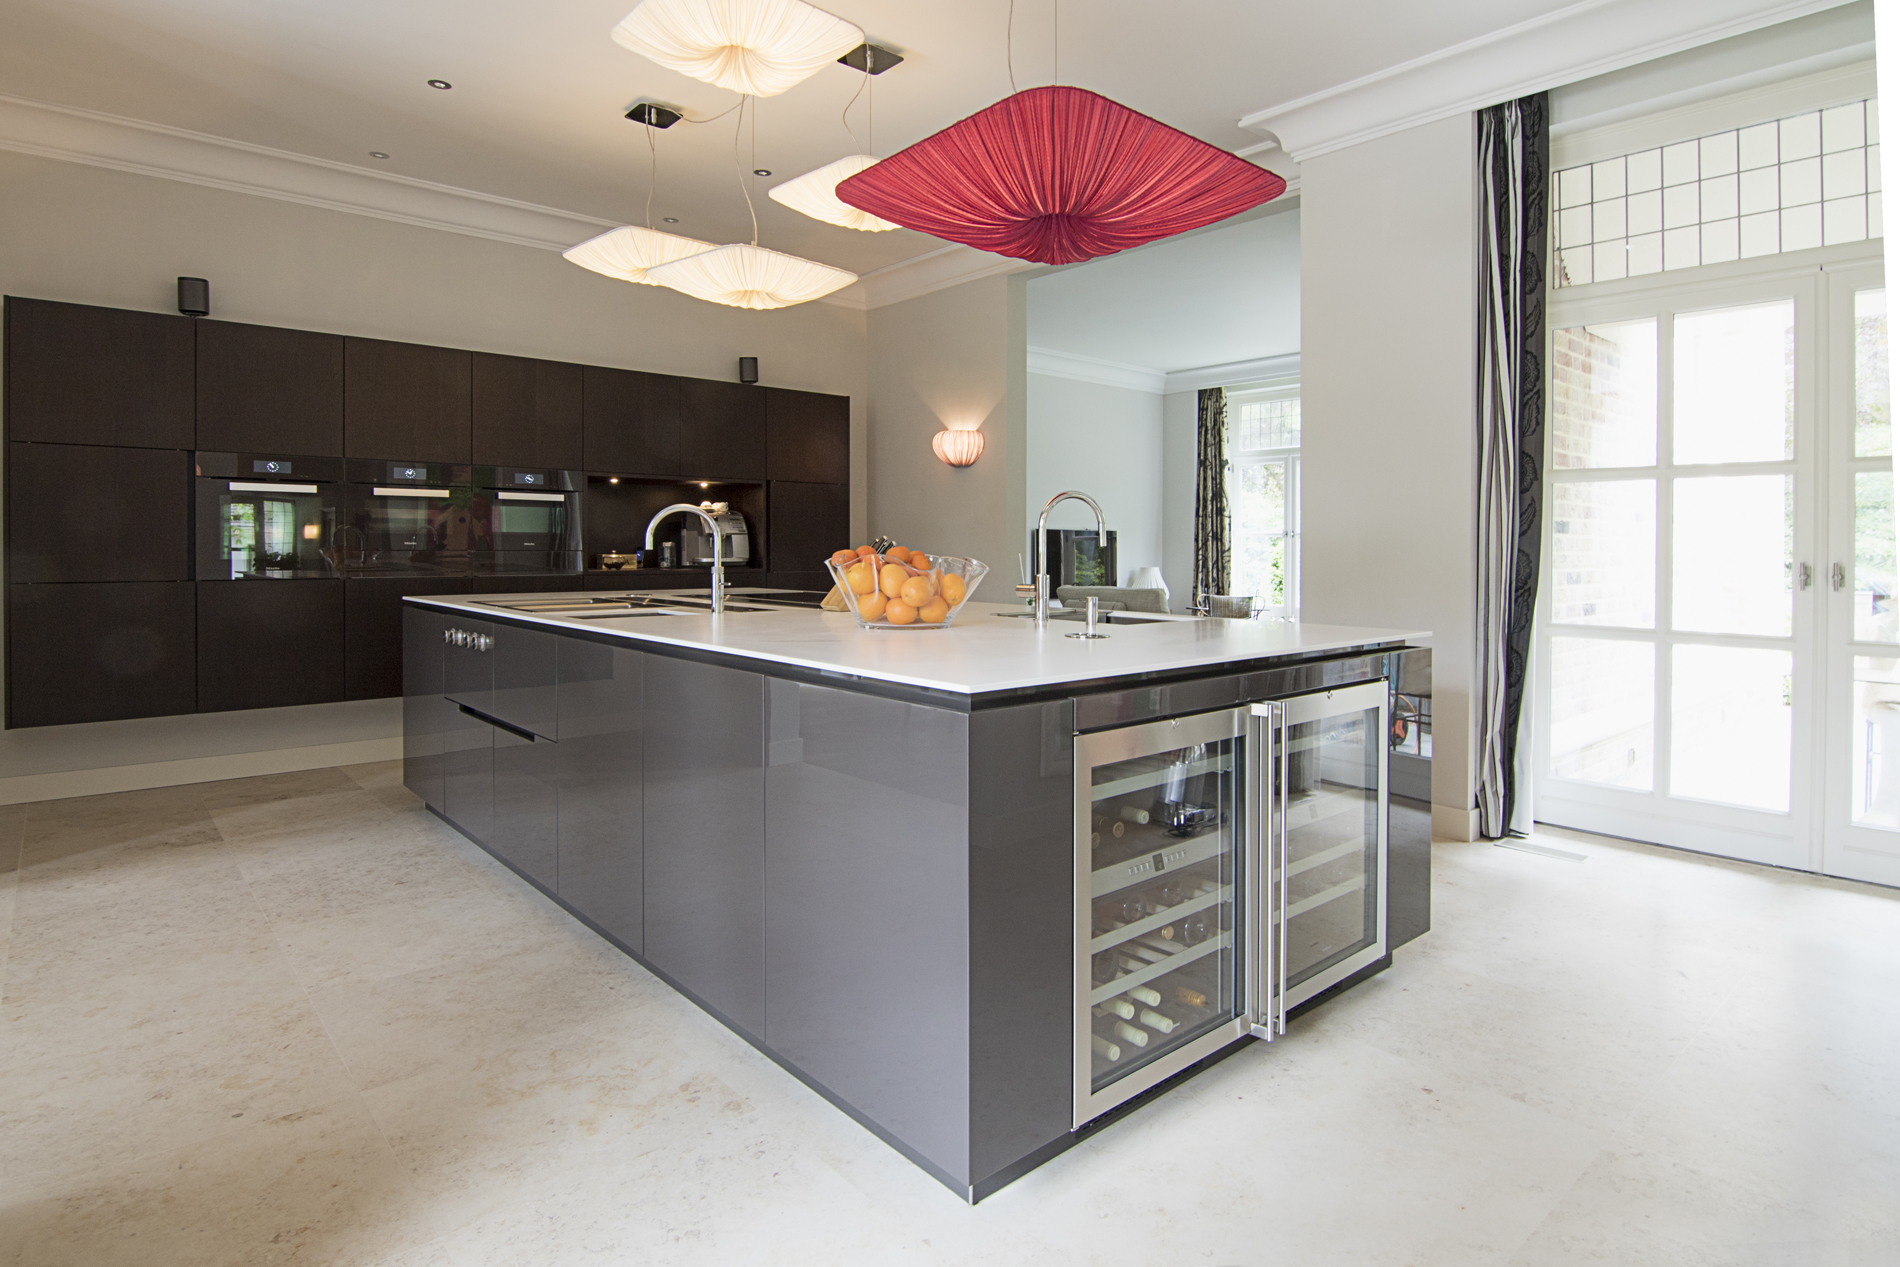 Design keukens nieuwe keuken kopen? aswa keukens